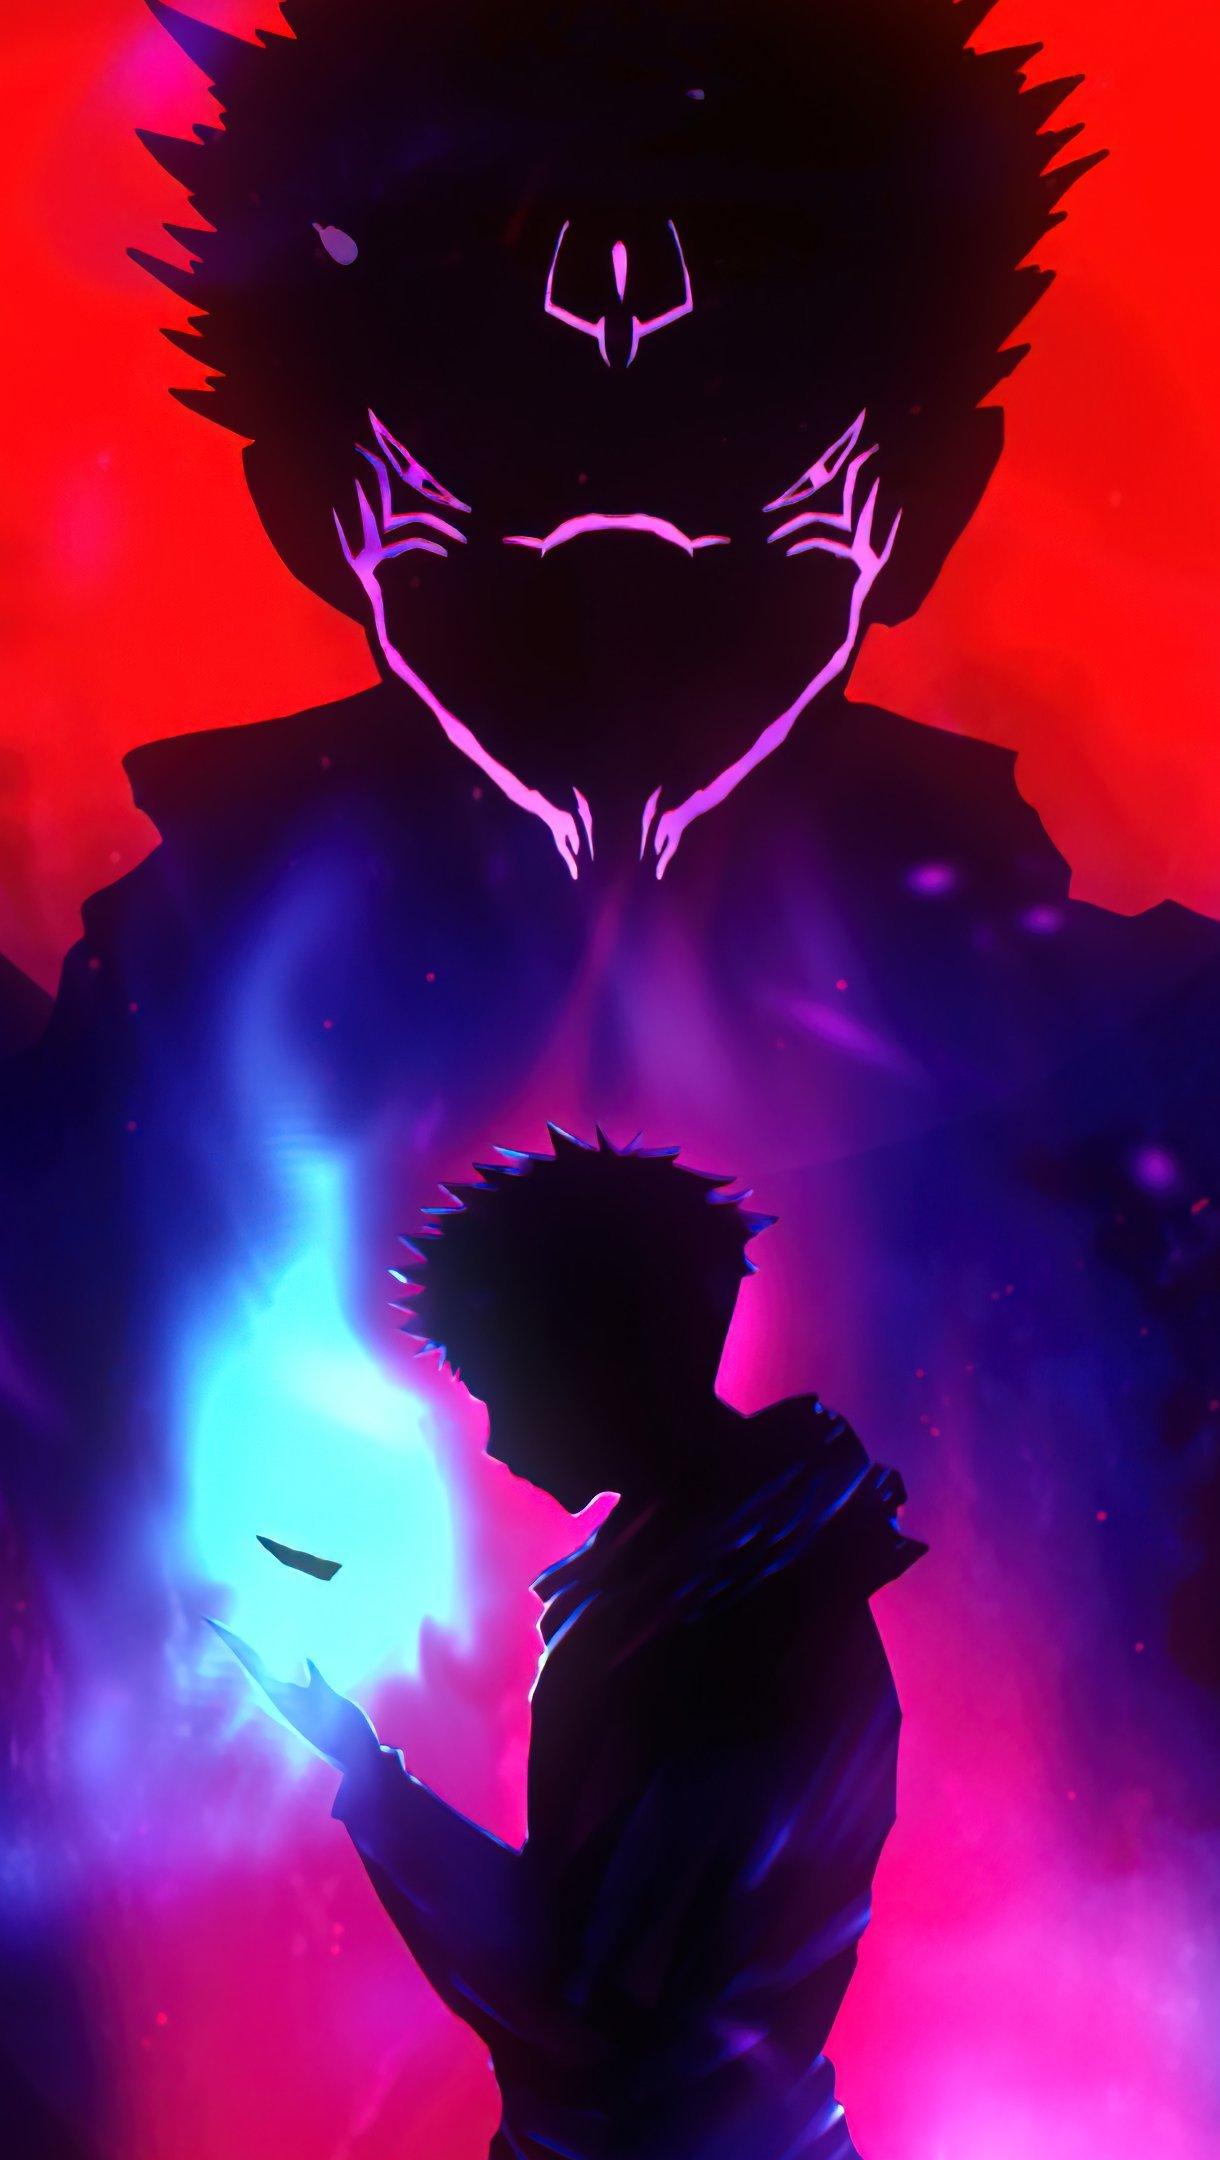 Anime Wallpaper Yuji Itadori from Jujutsu Kaisen Vertical